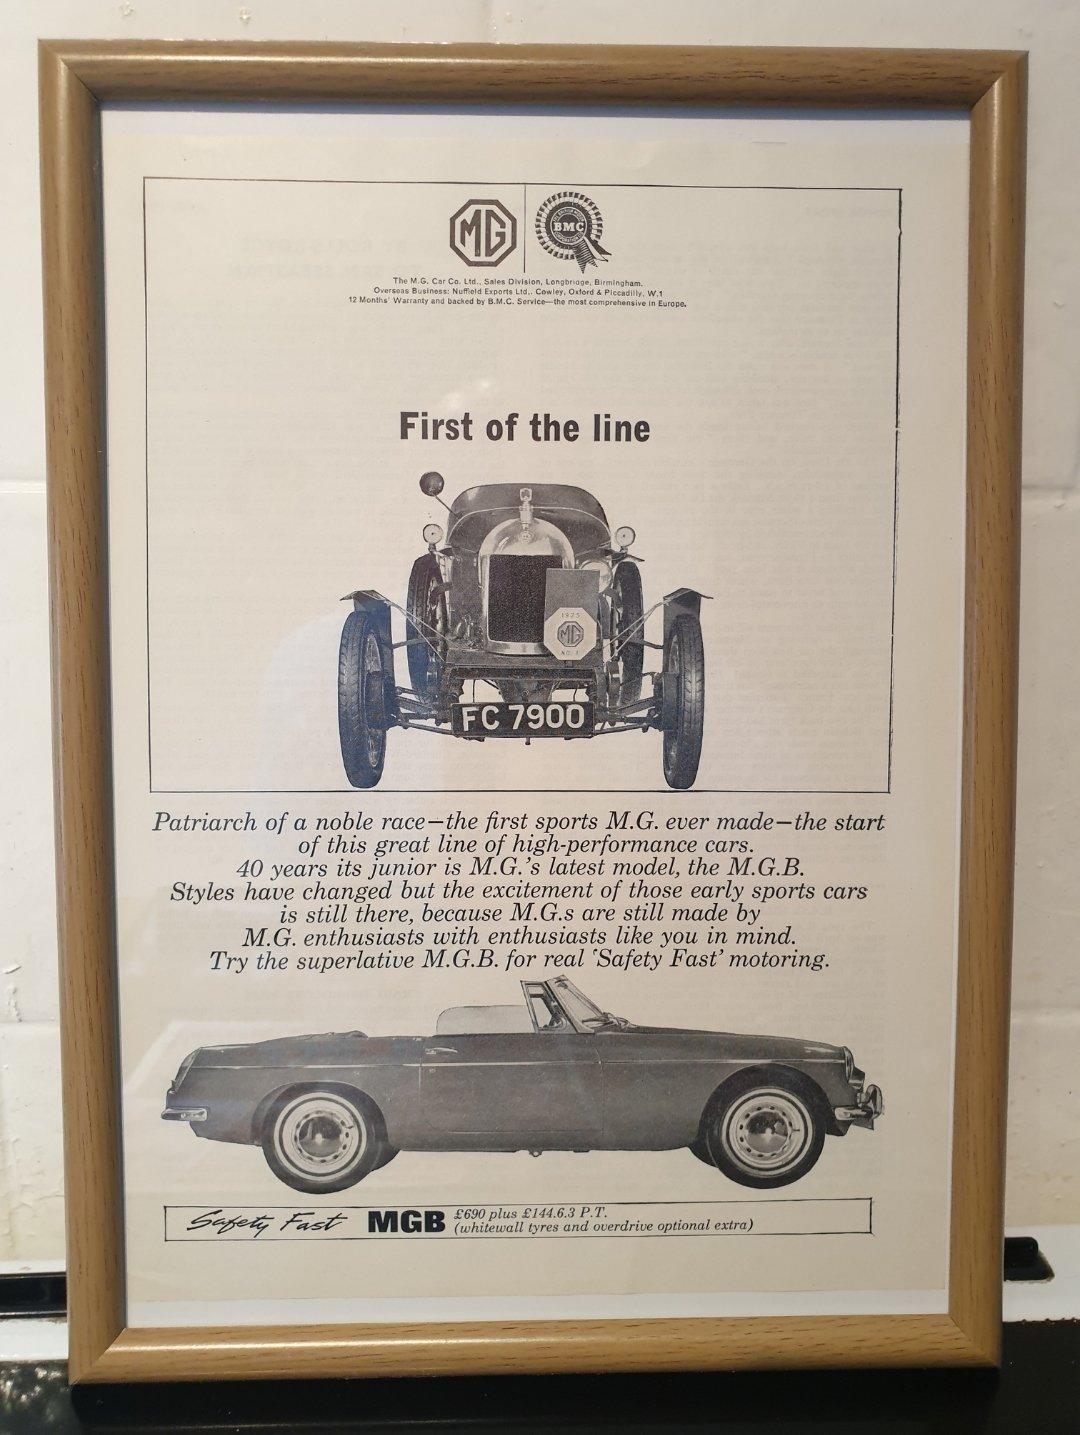 1964 MGB Framed Advert Original  For Sale (picture 1 of 2)